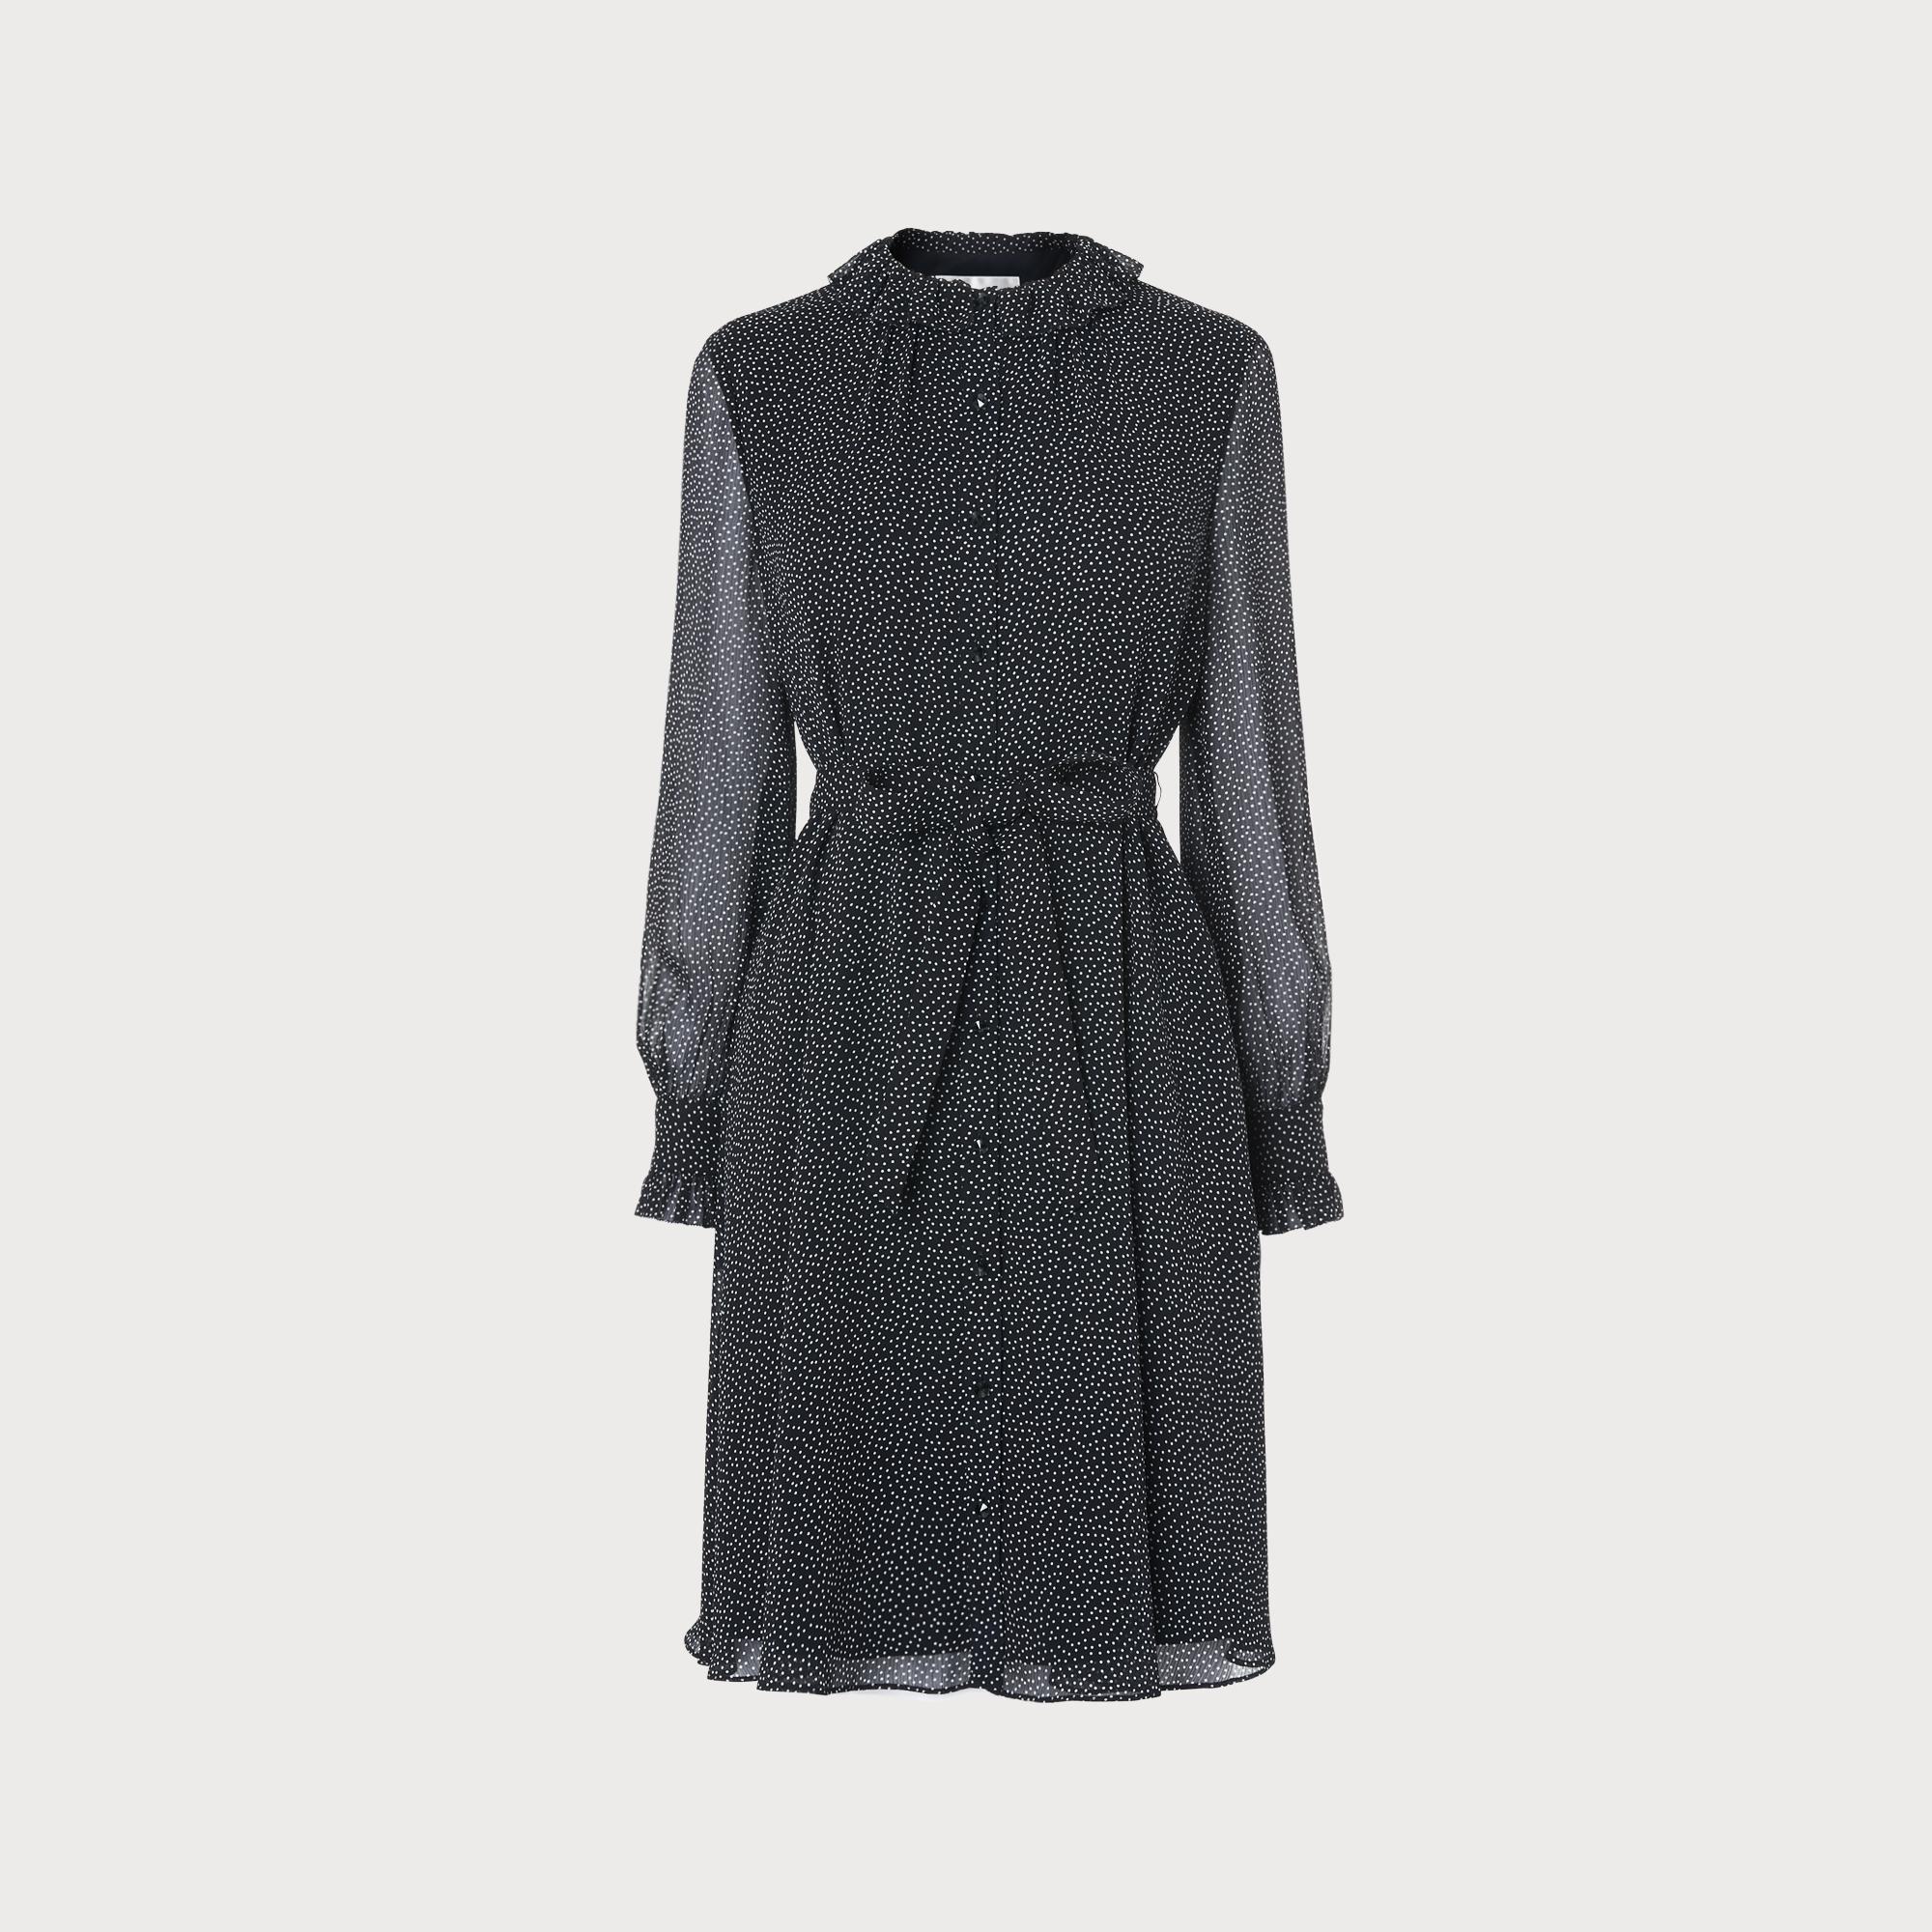 Navy Polka Dot Dress